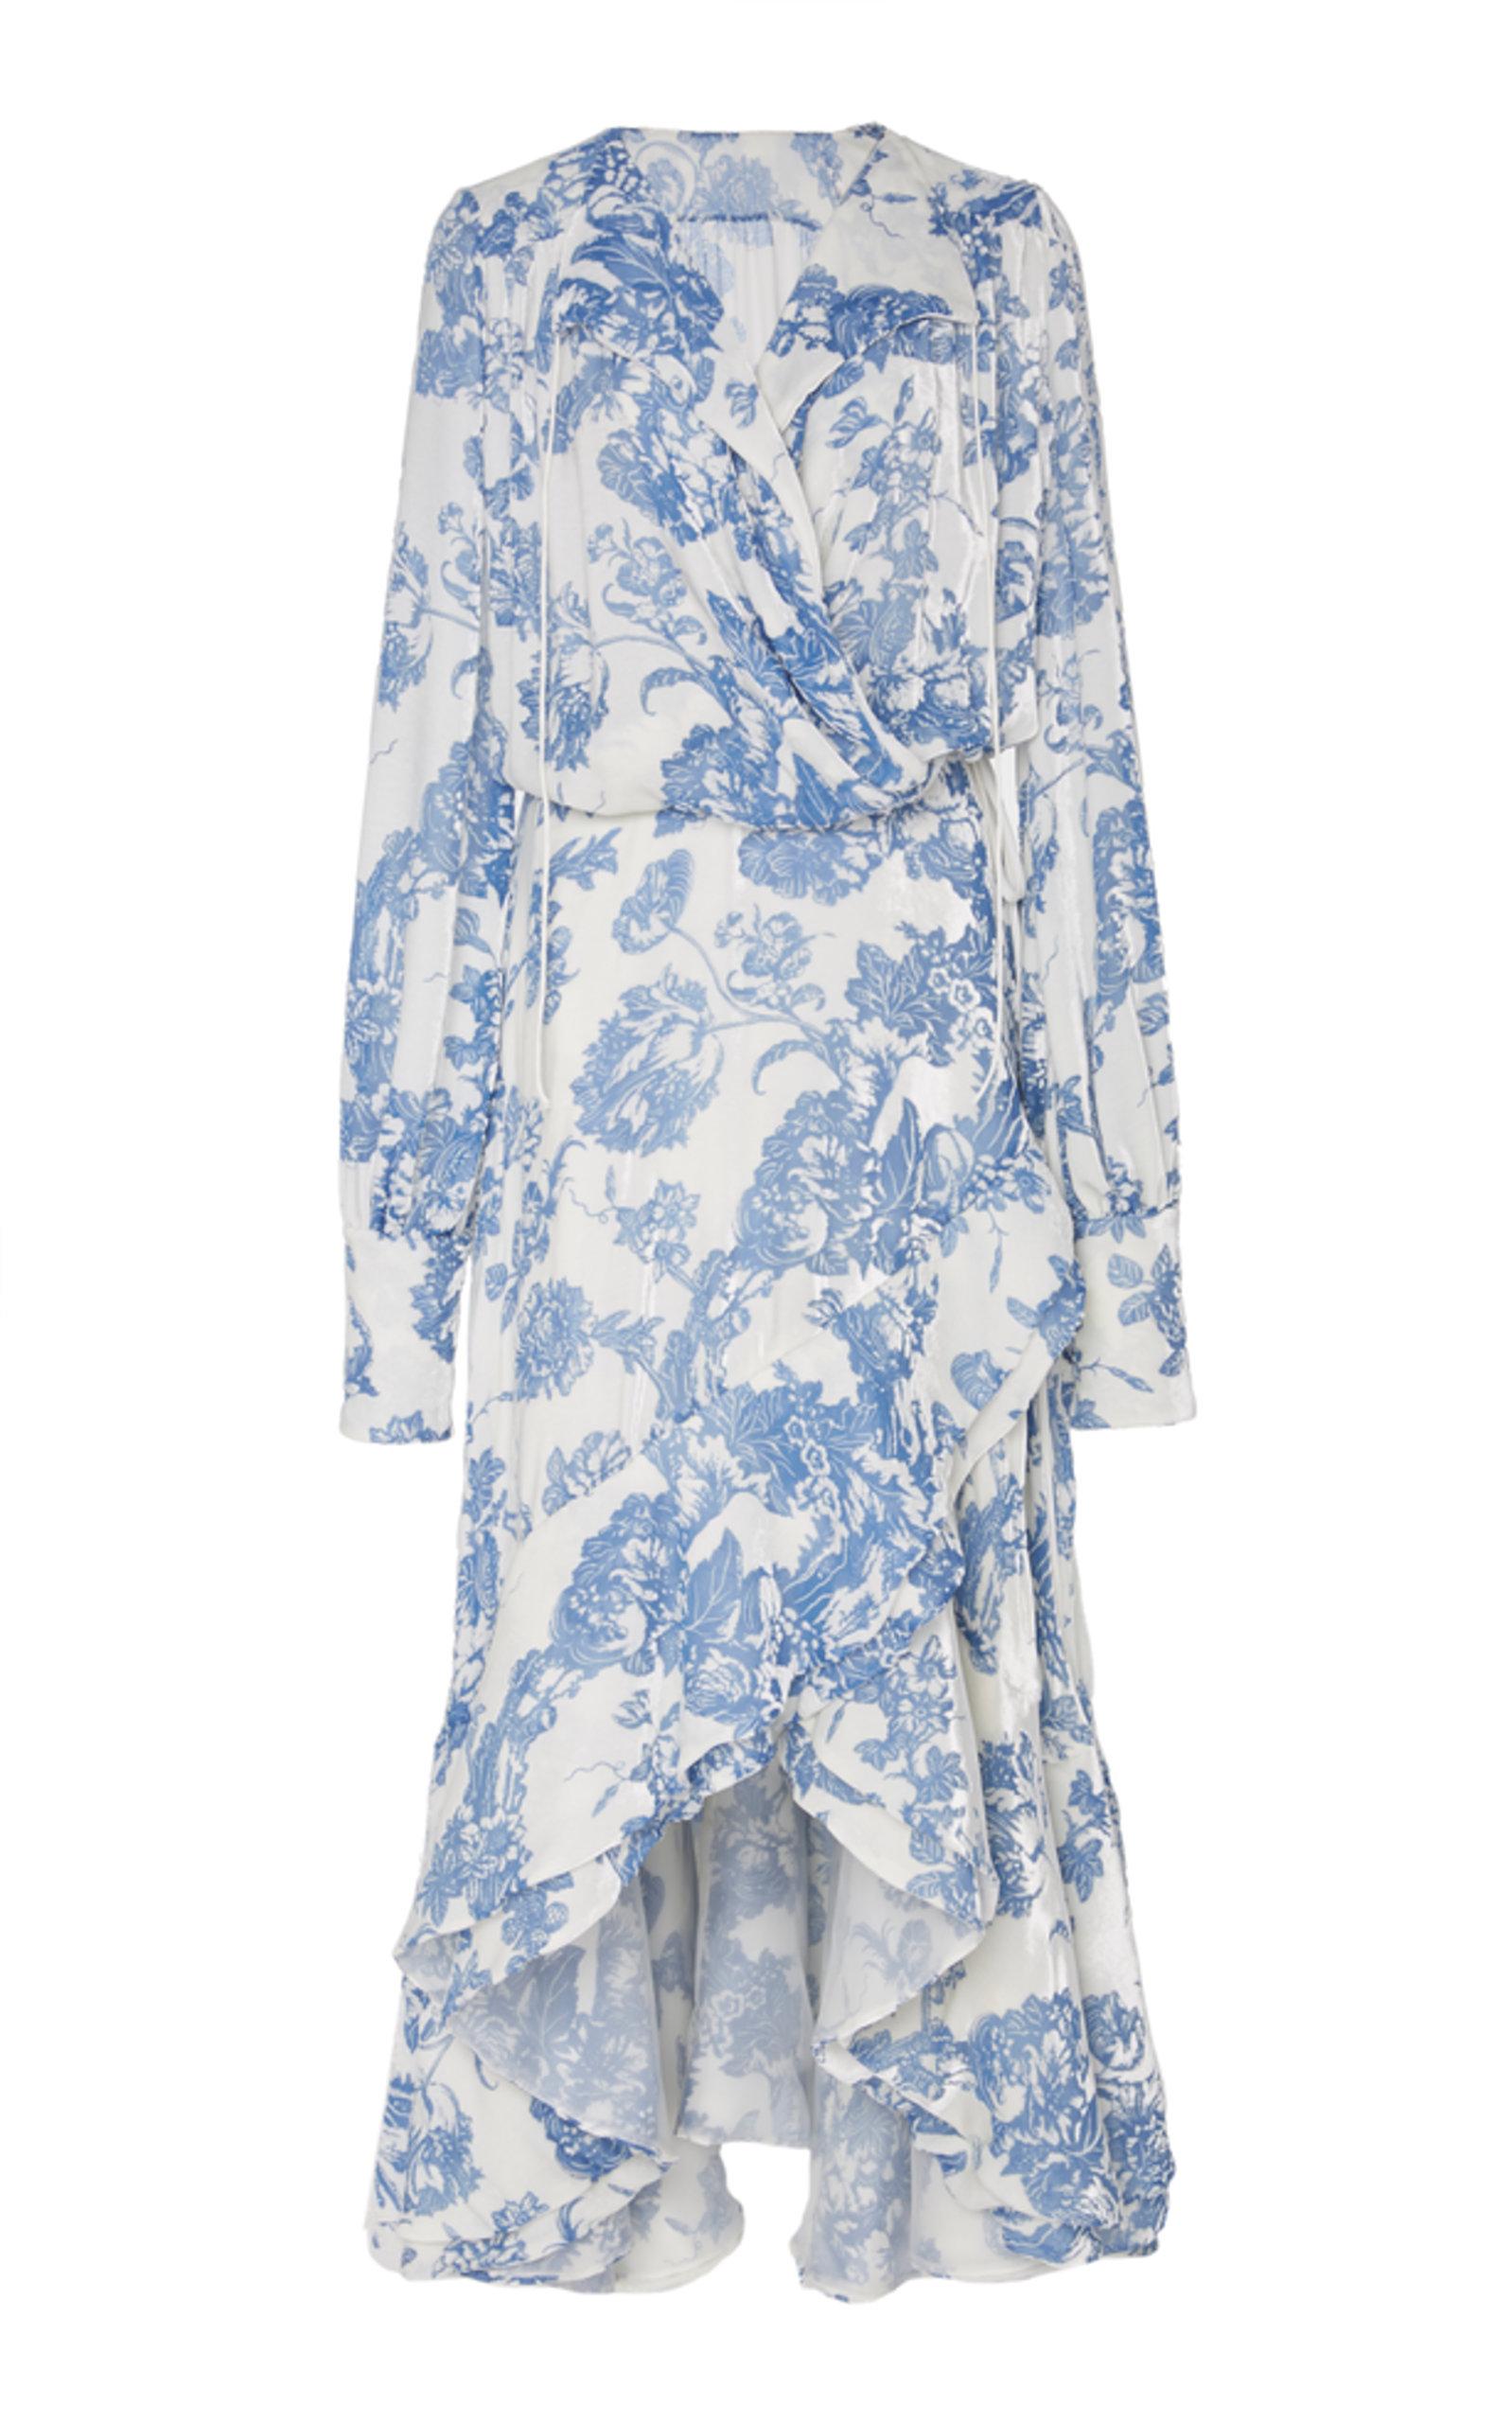 317145ef6230a Long Sleeve Cocktail Dress by Oscar de la Renta